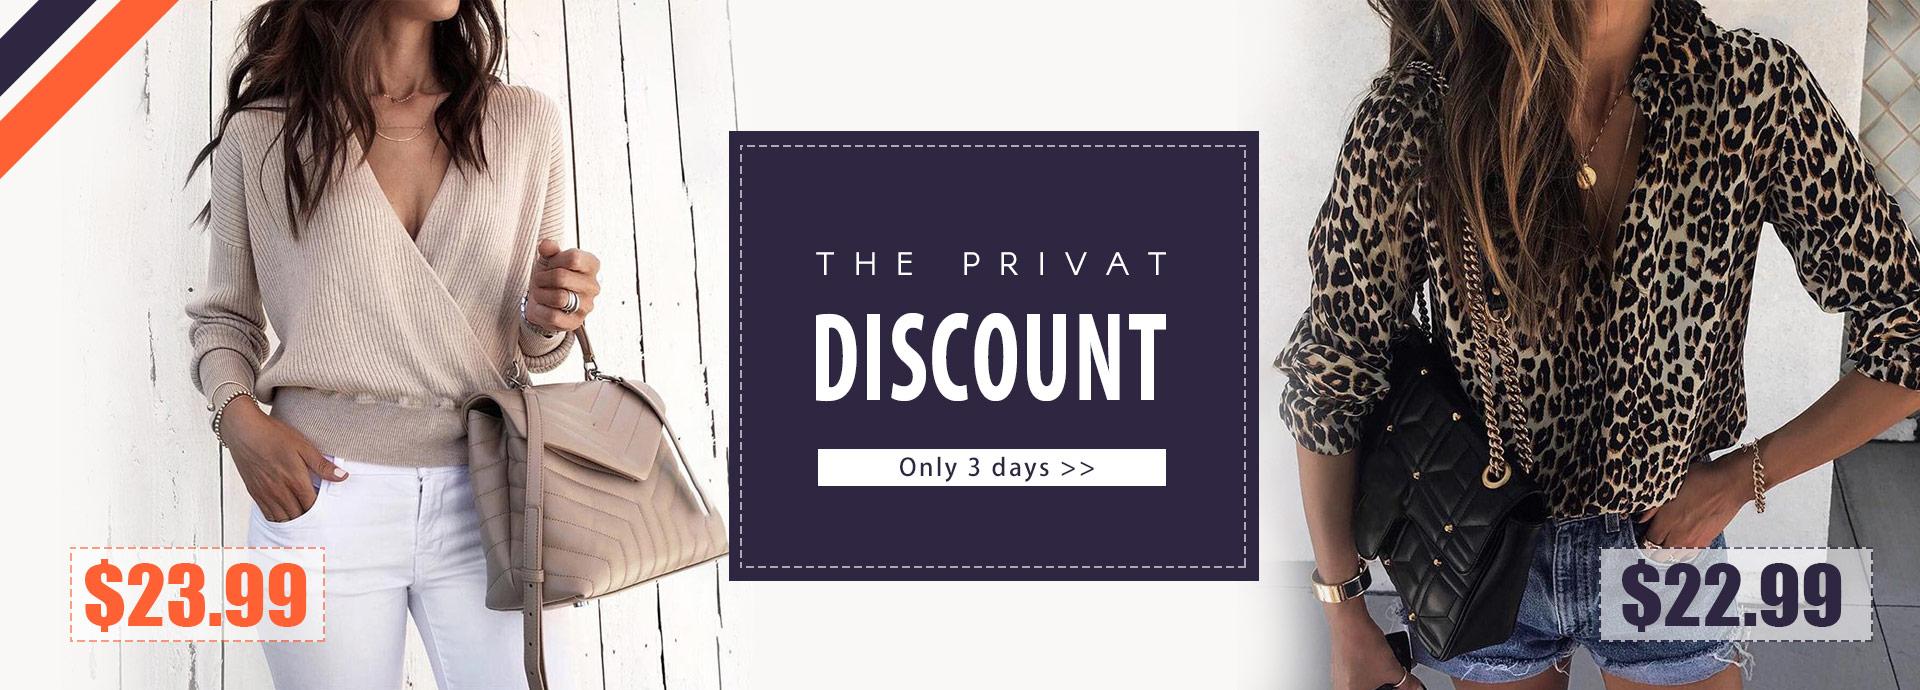 The Private Discount